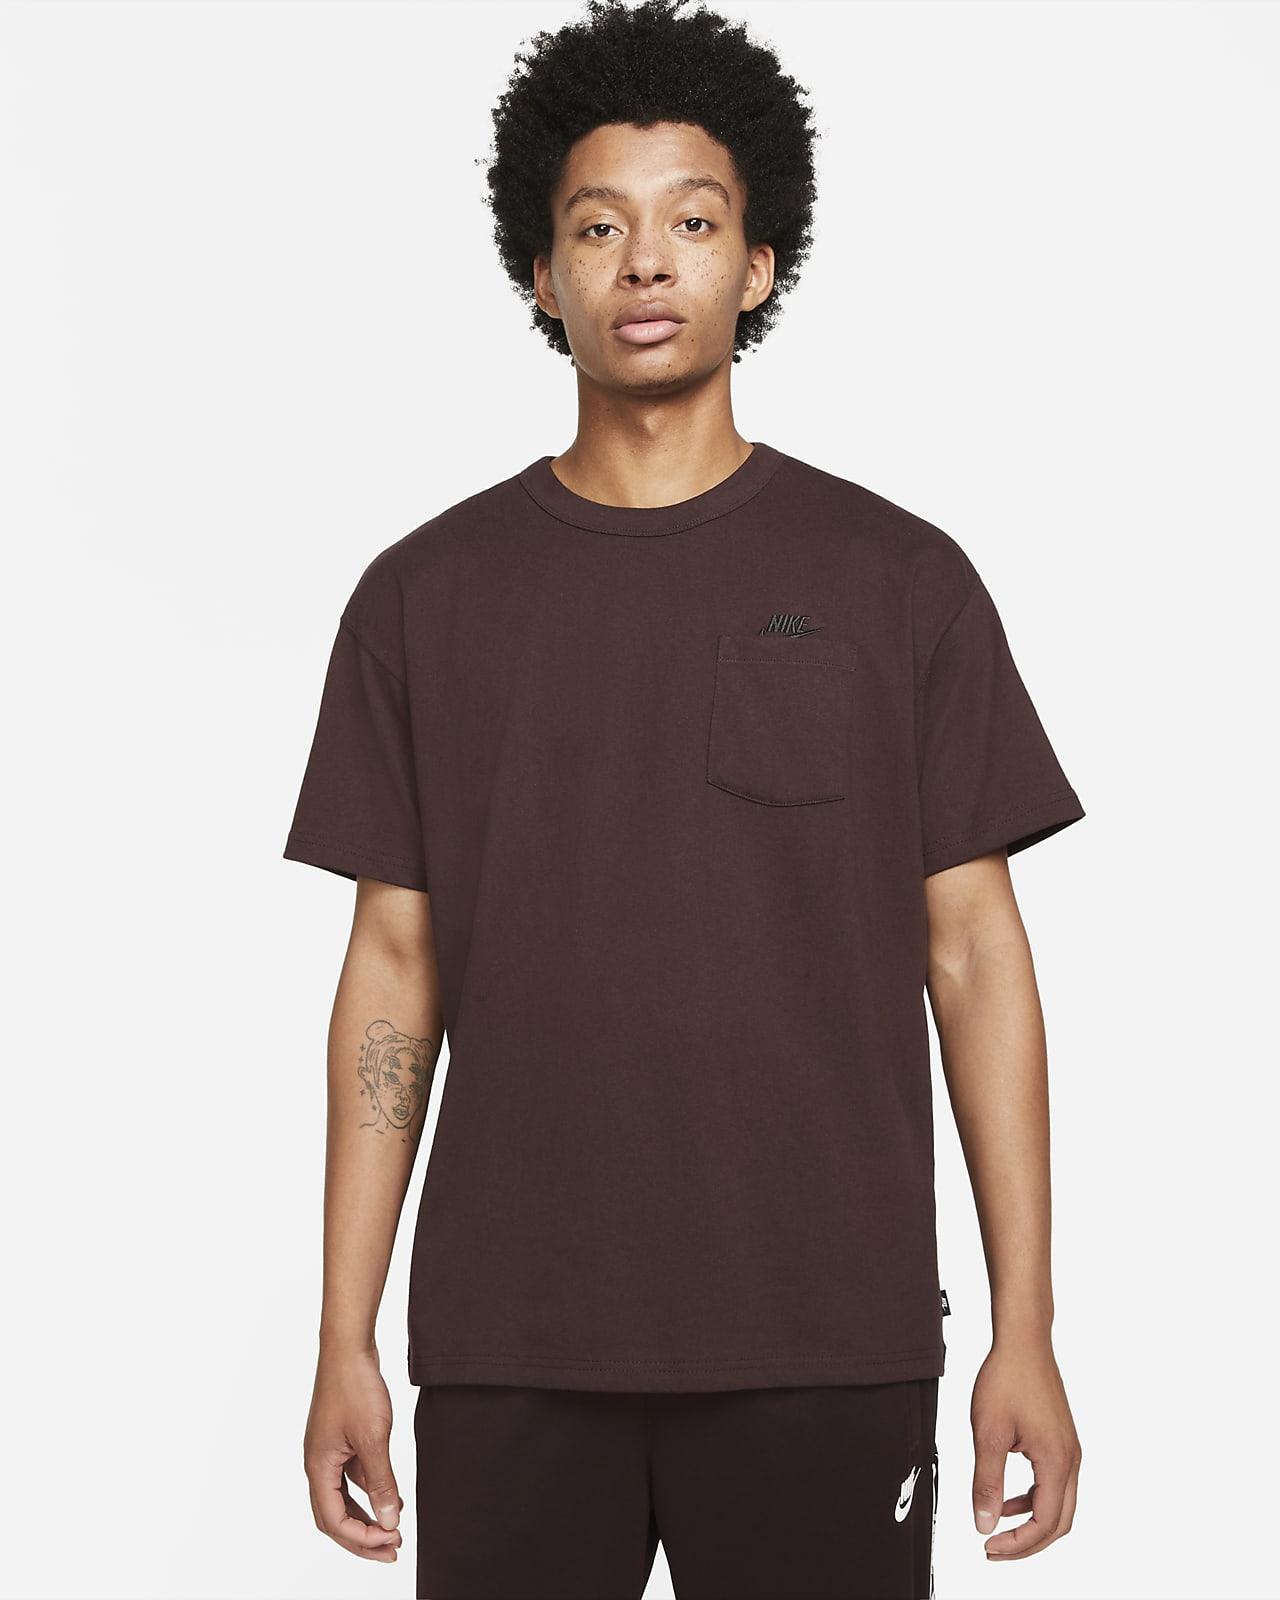 Мужская футболка с карманом Nike Sportswear Premium Essentials